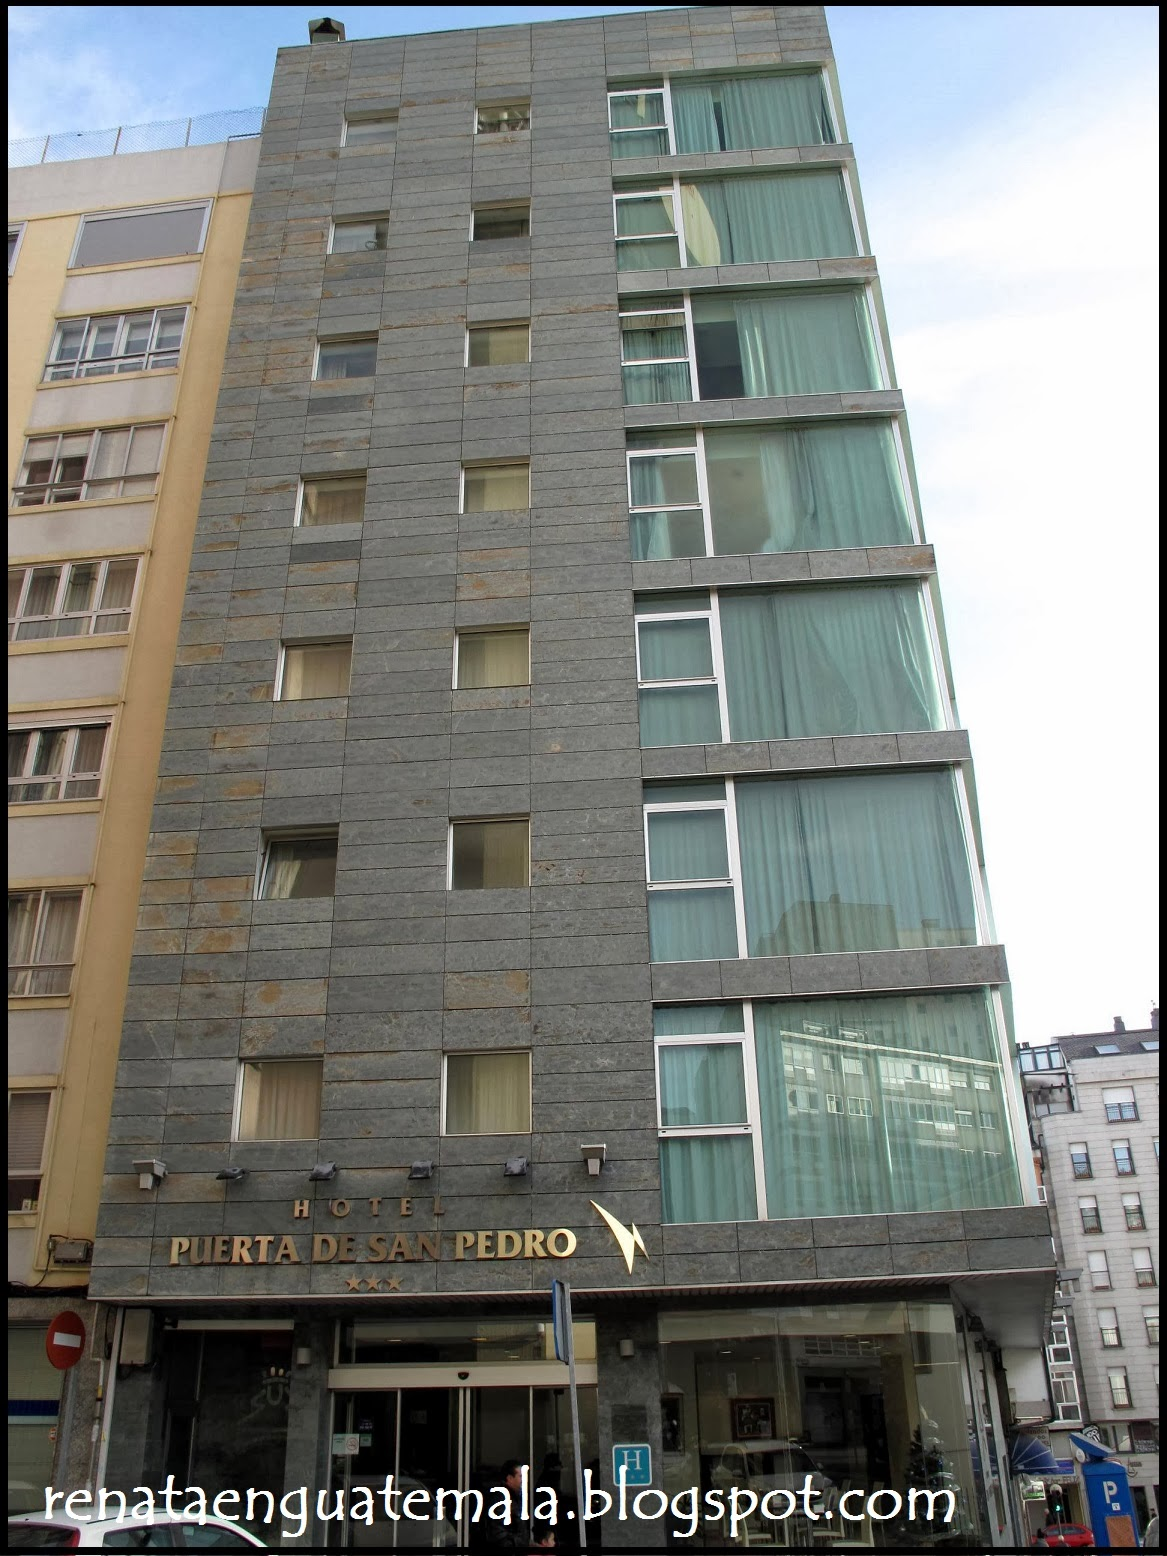 Anduri a hotel puerta de san pedro lugo - Hotel puerta de san pedro lugo ...